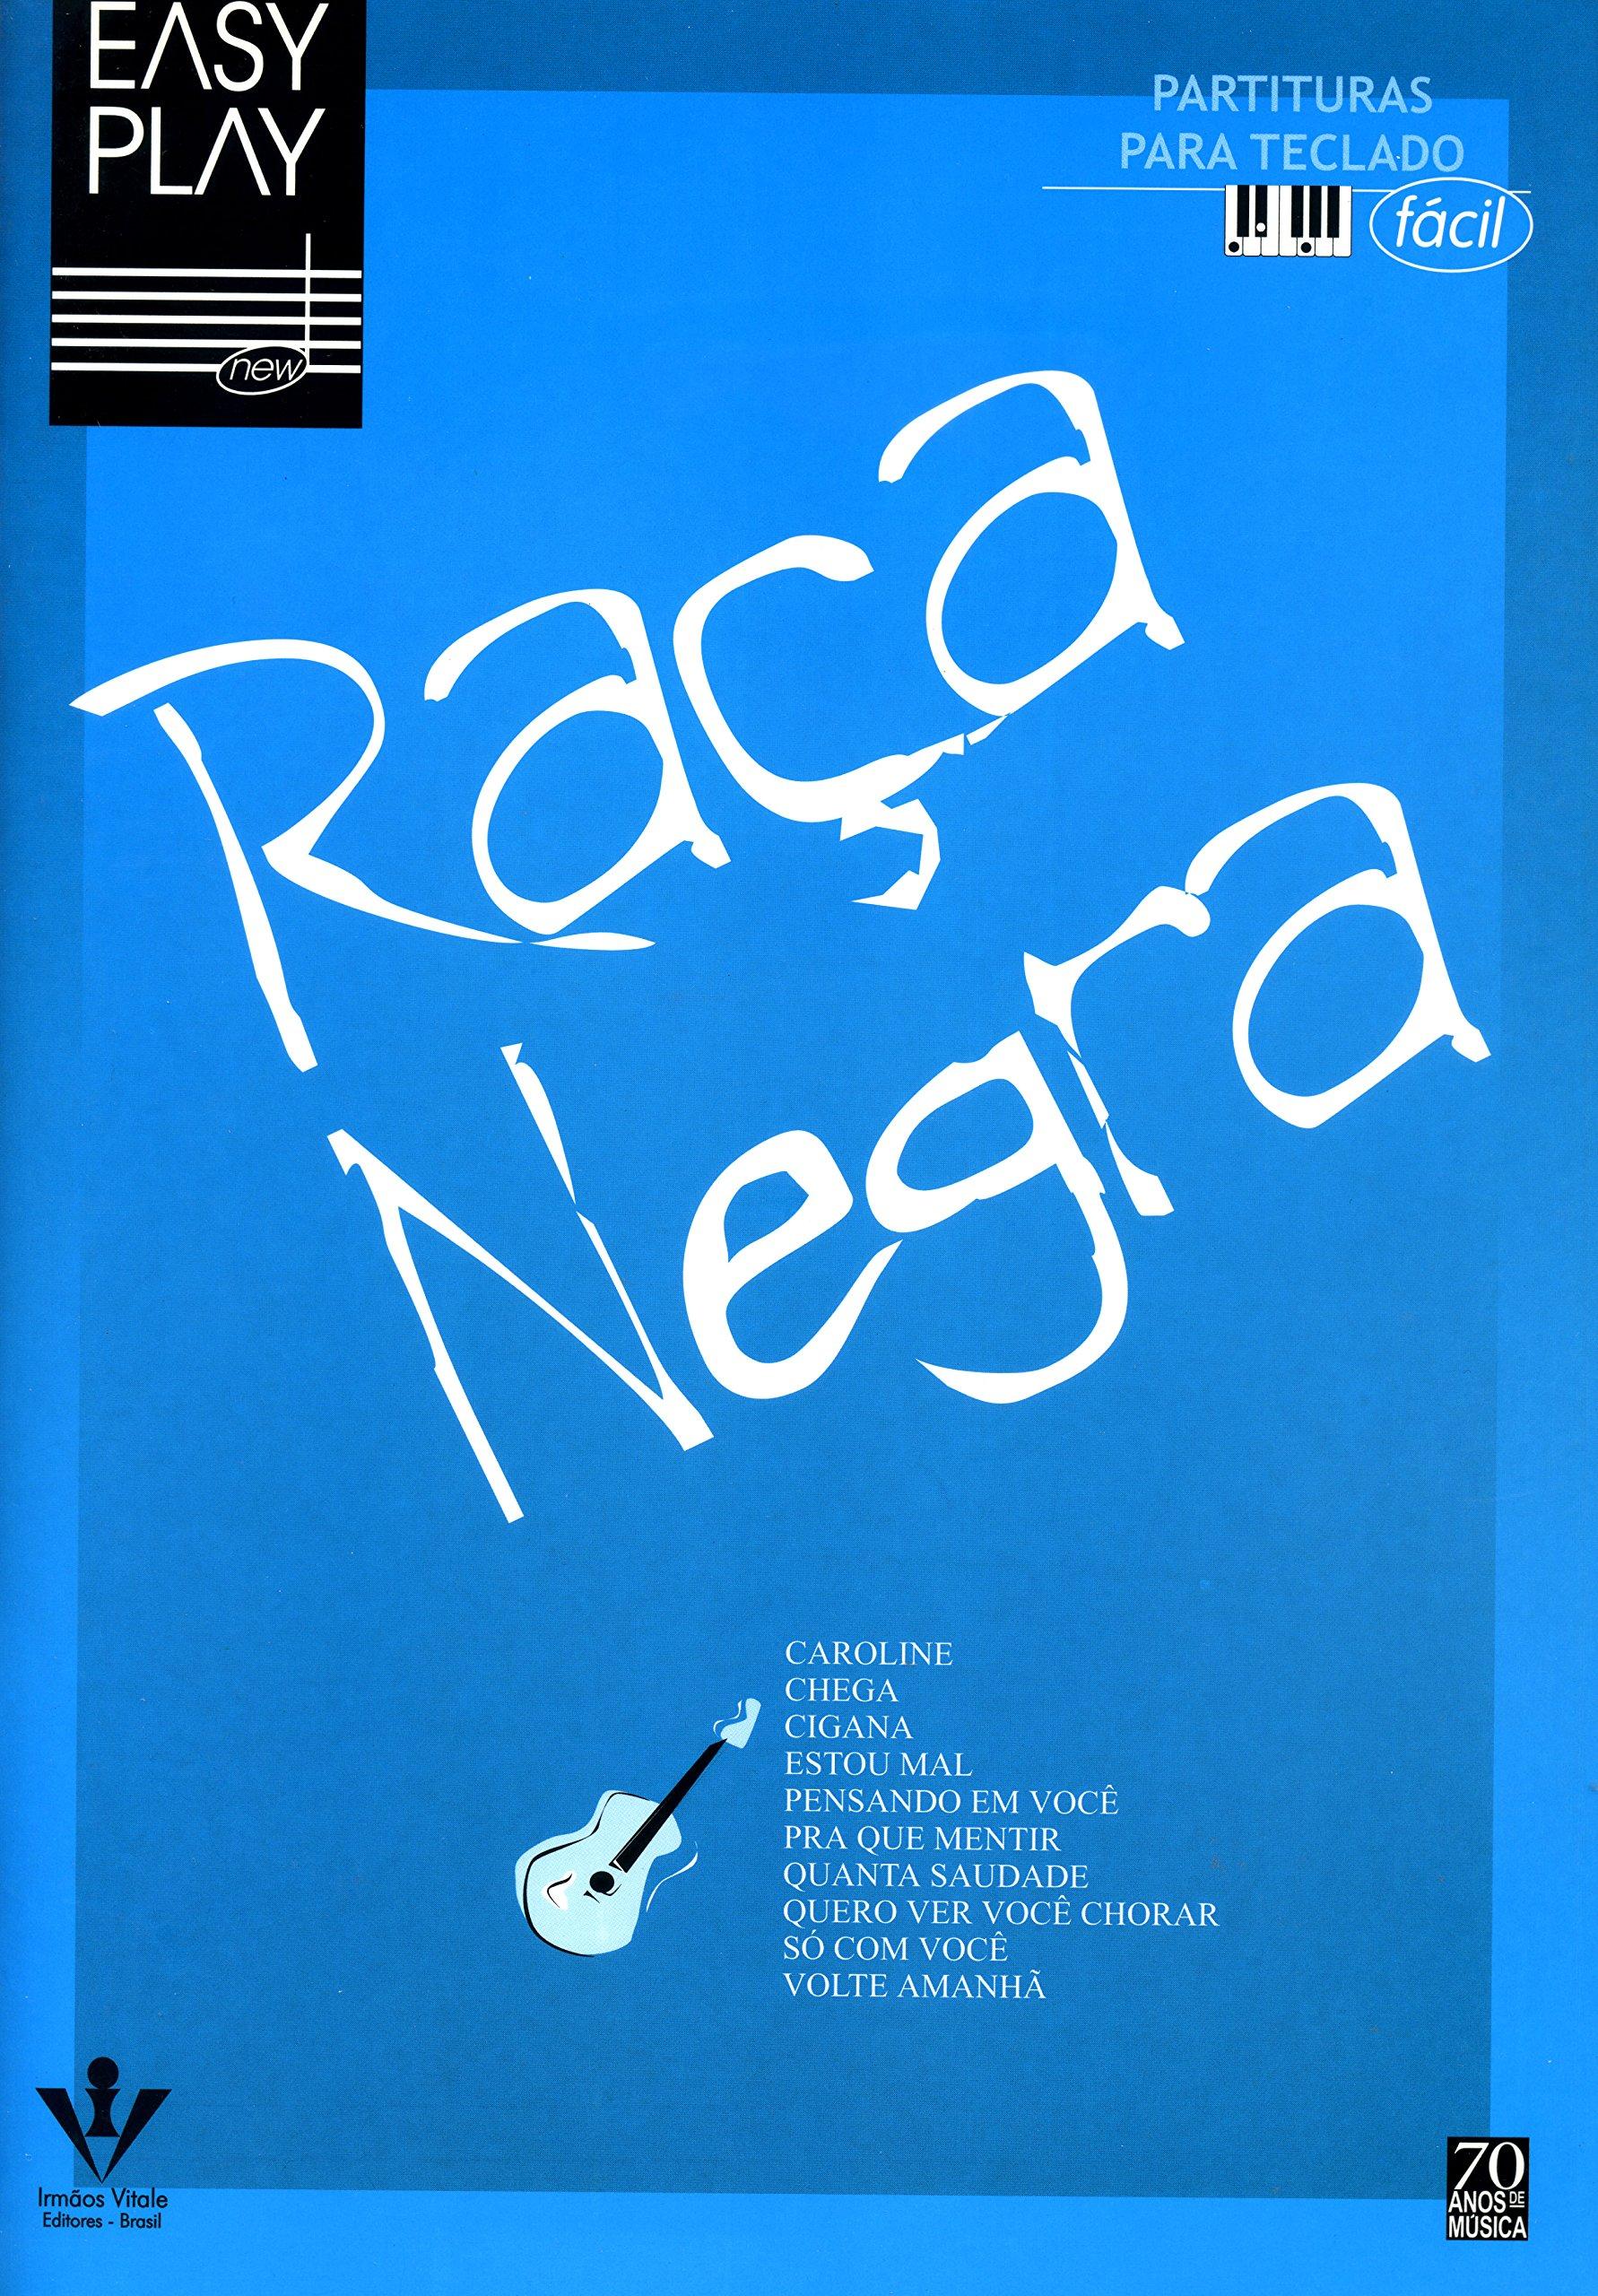 Easy Play. Raça Negra (Portuguese Brazilian) Paperback – 1996